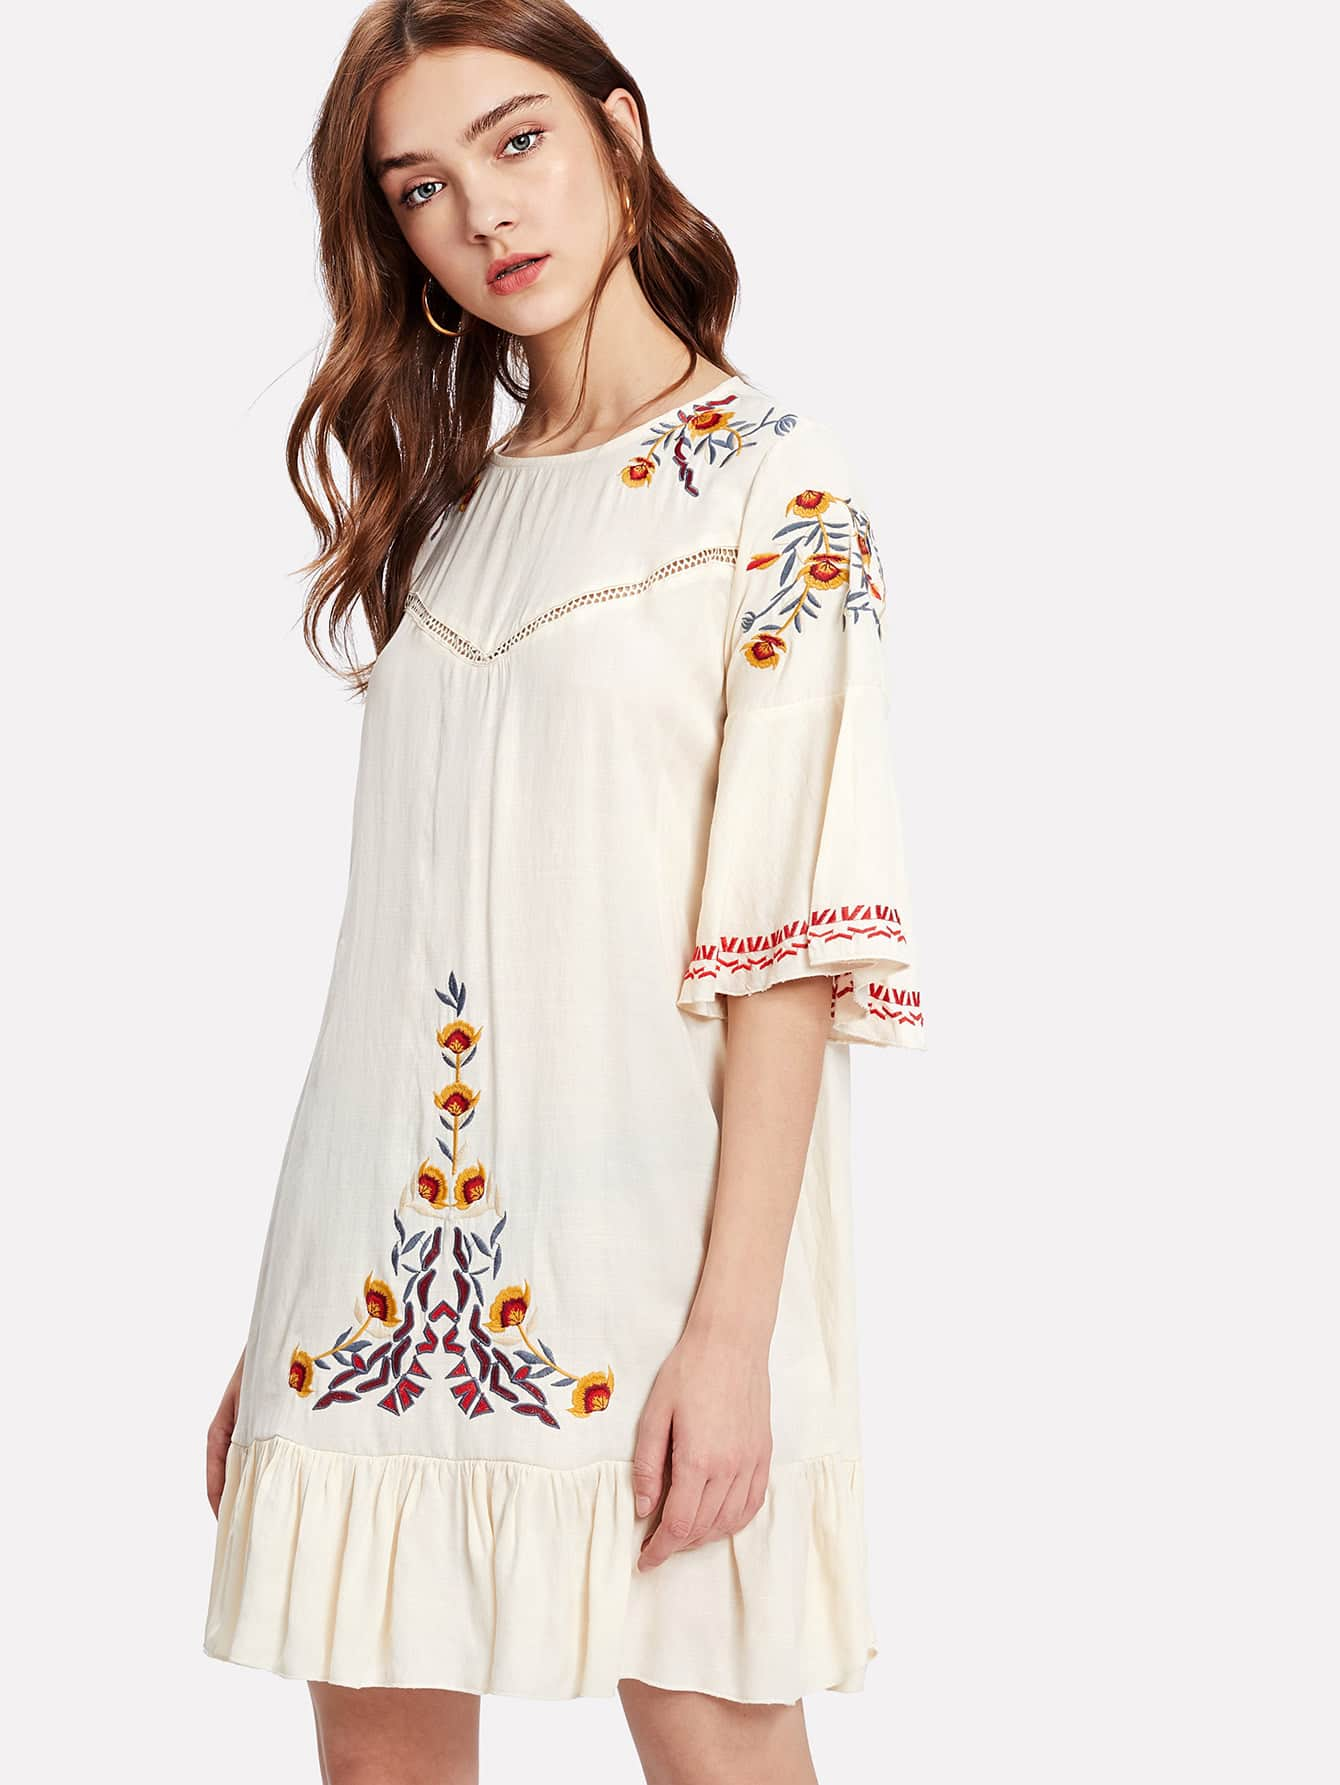 Ruffle Hem Flower Embroidered Dress embroidered double layer asym hem sheath dress